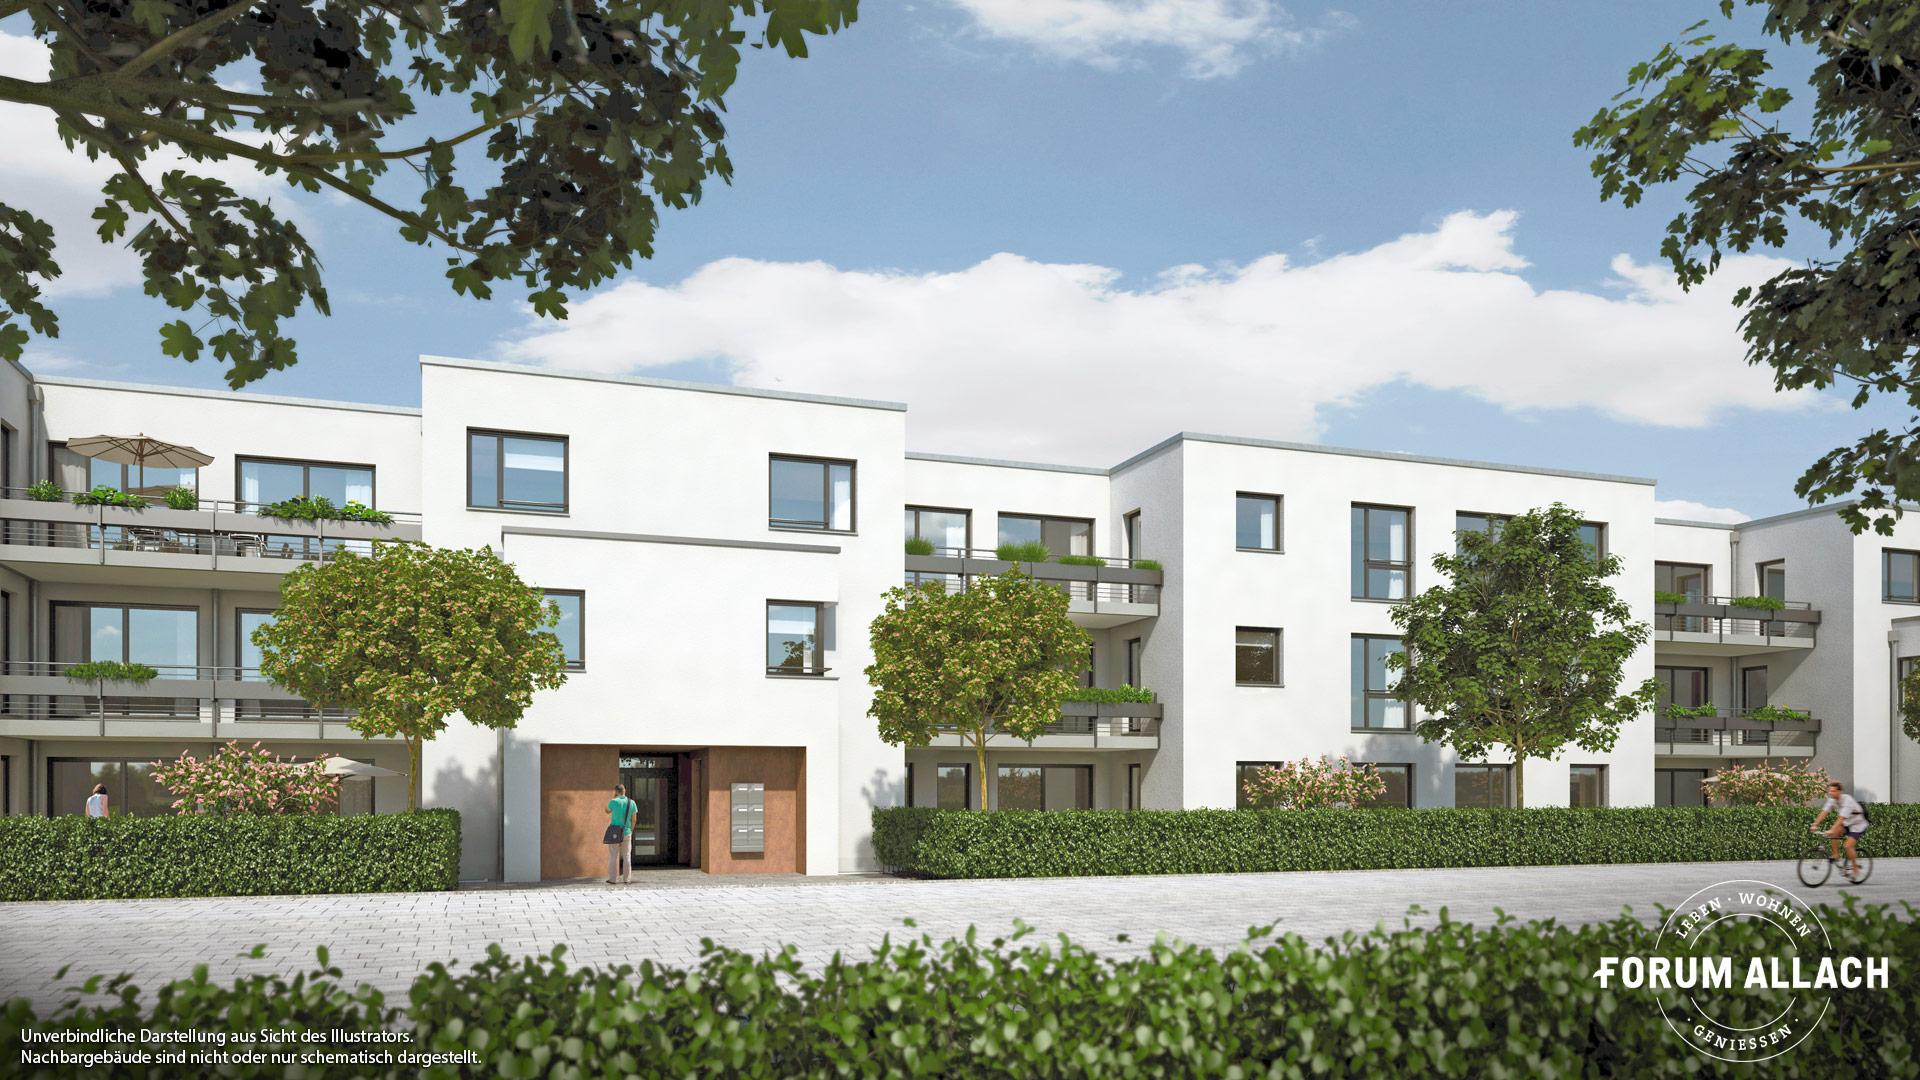 Immobilie Forum Allach - Illustration 5